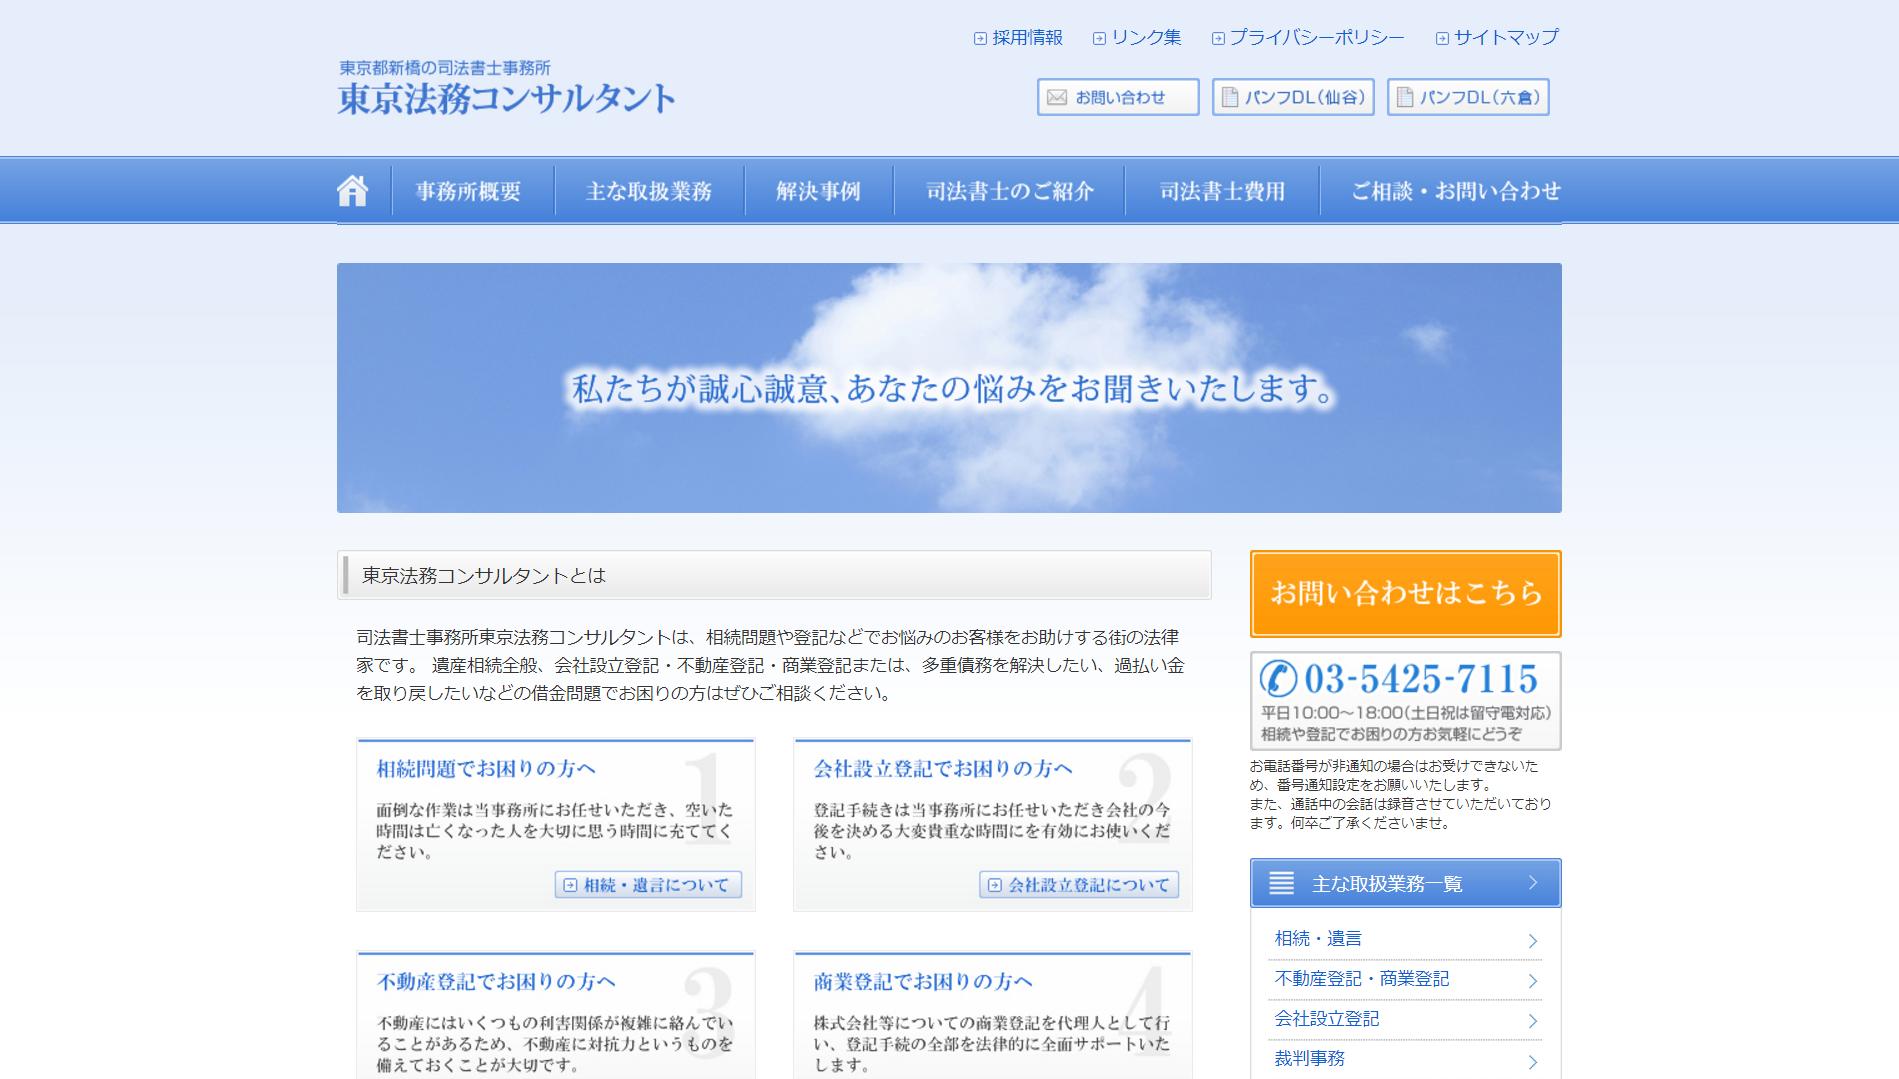 司法書士事務所東京法務コンサルタント(東京都港区西新橋)